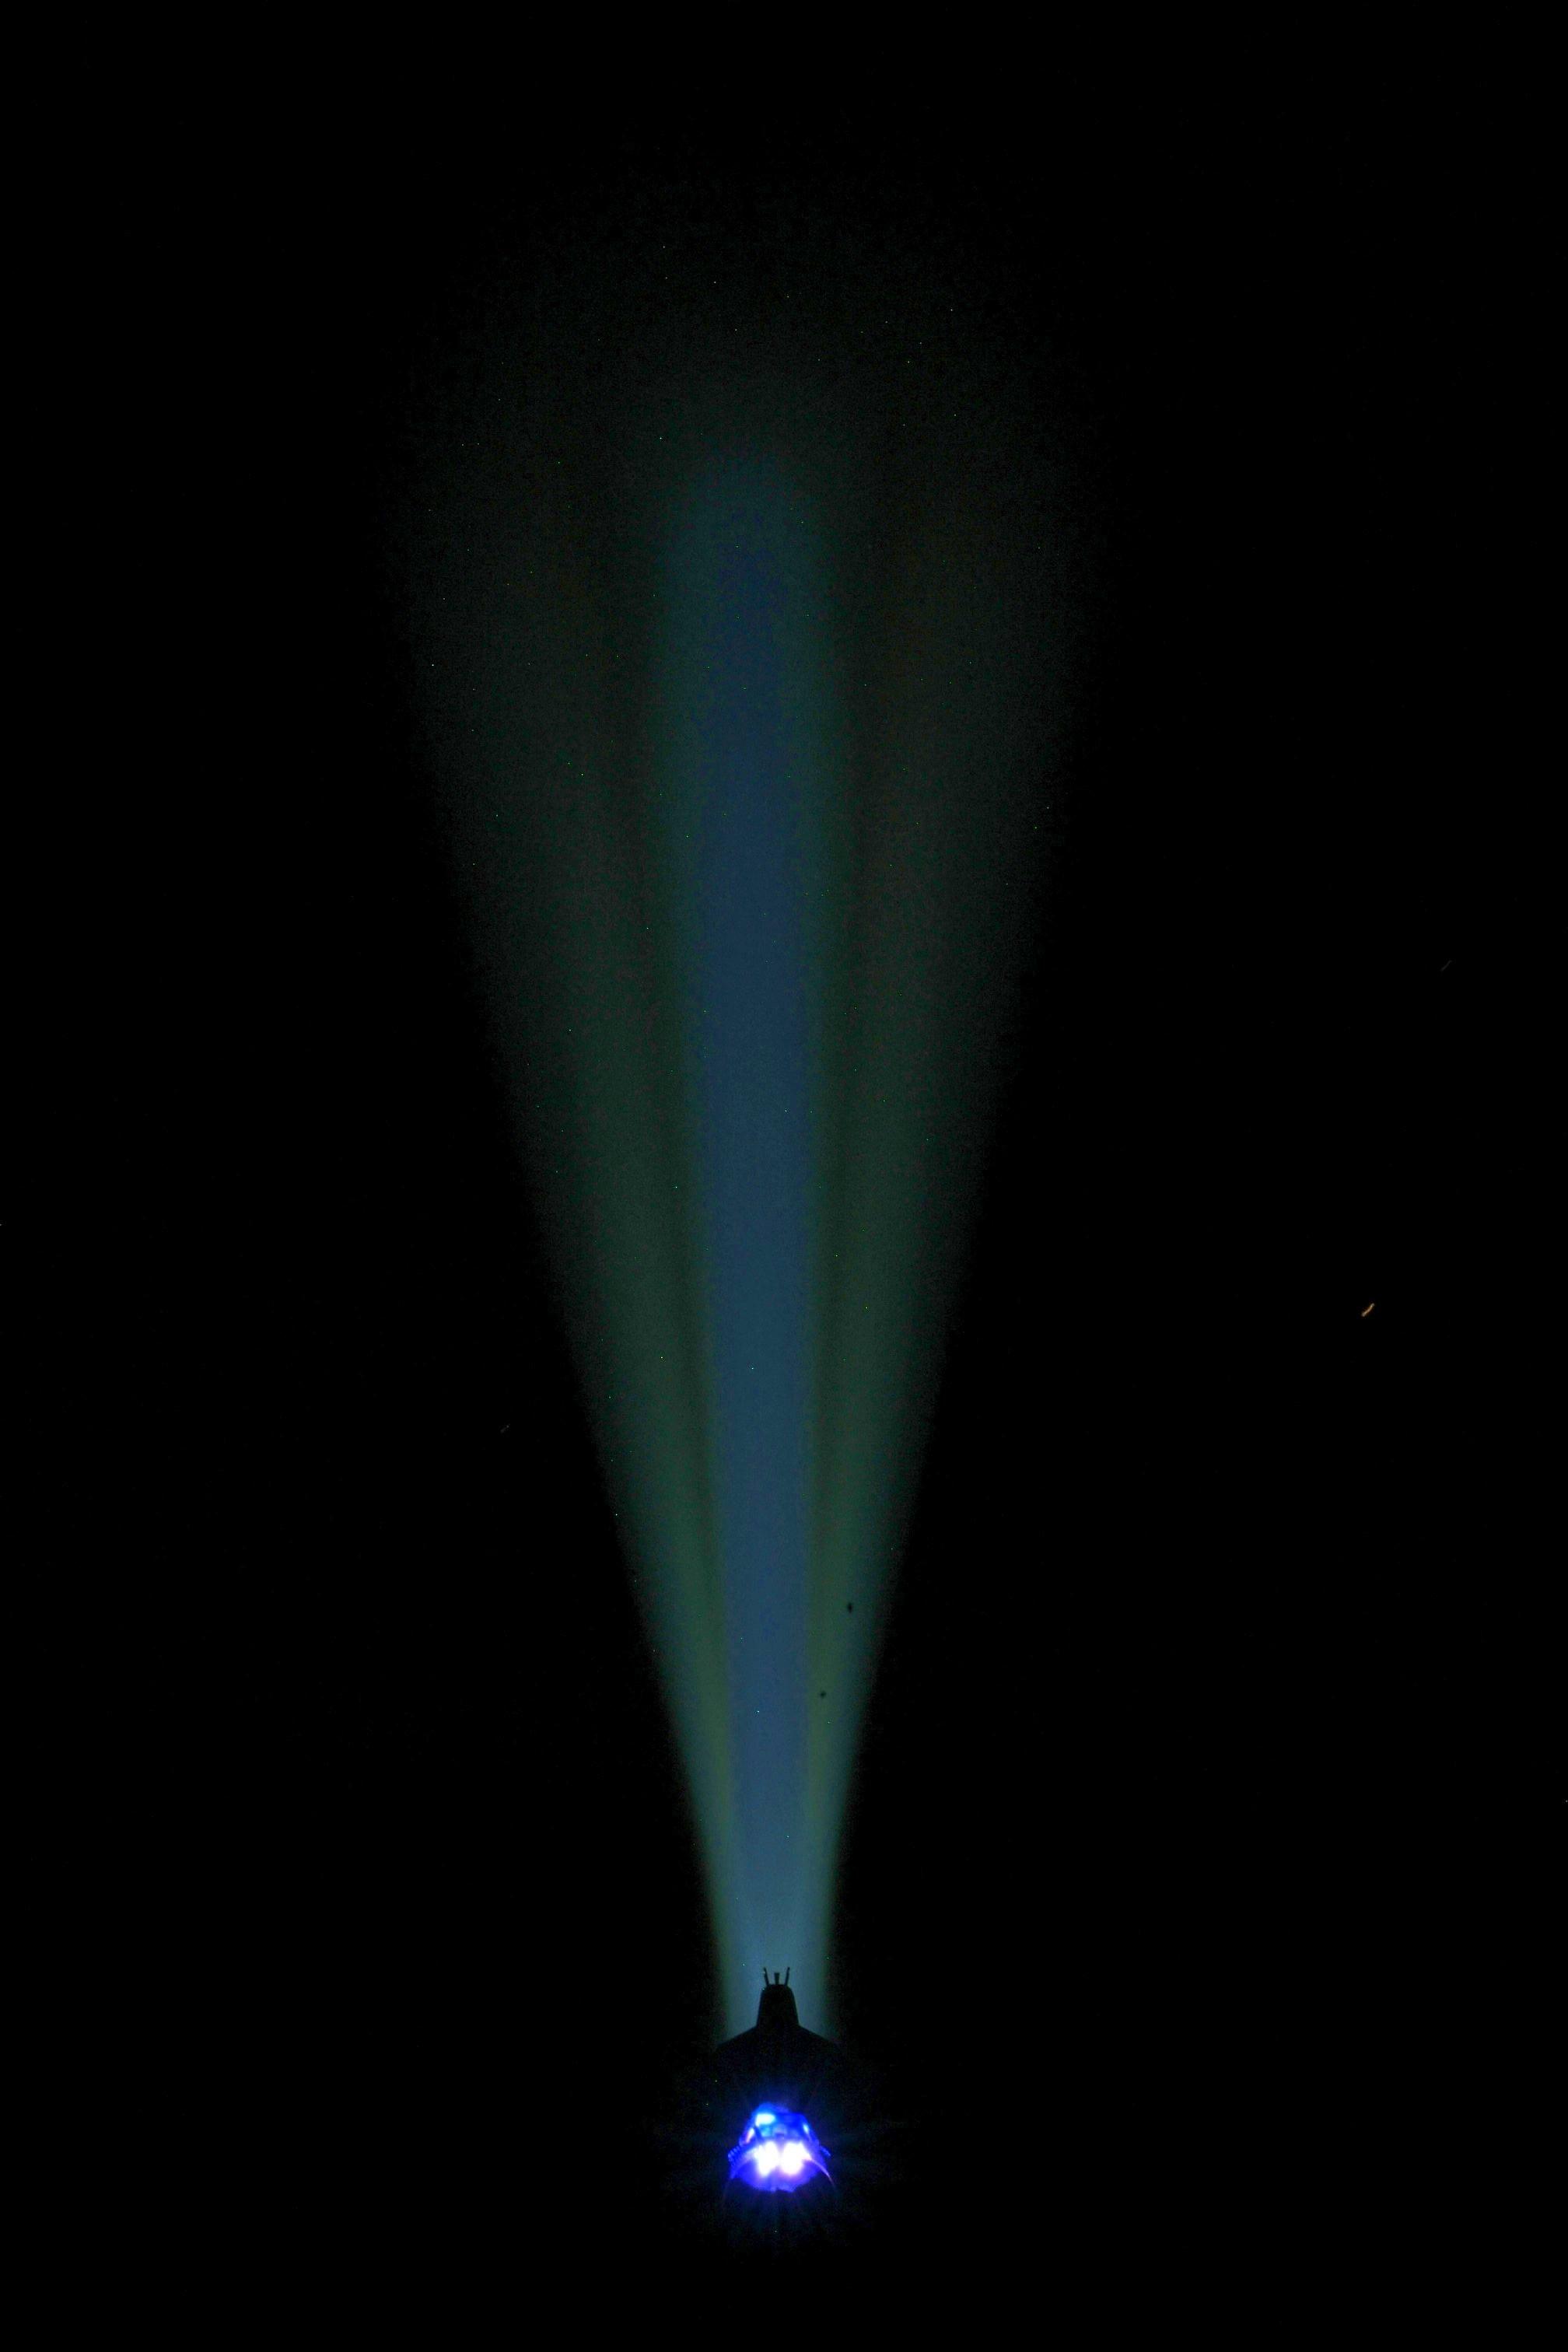 Storm of Ra >600,000 candela, 8000 emitter lumens, 6000 BEAM LUMENS, 4000K, translucent blue accents.